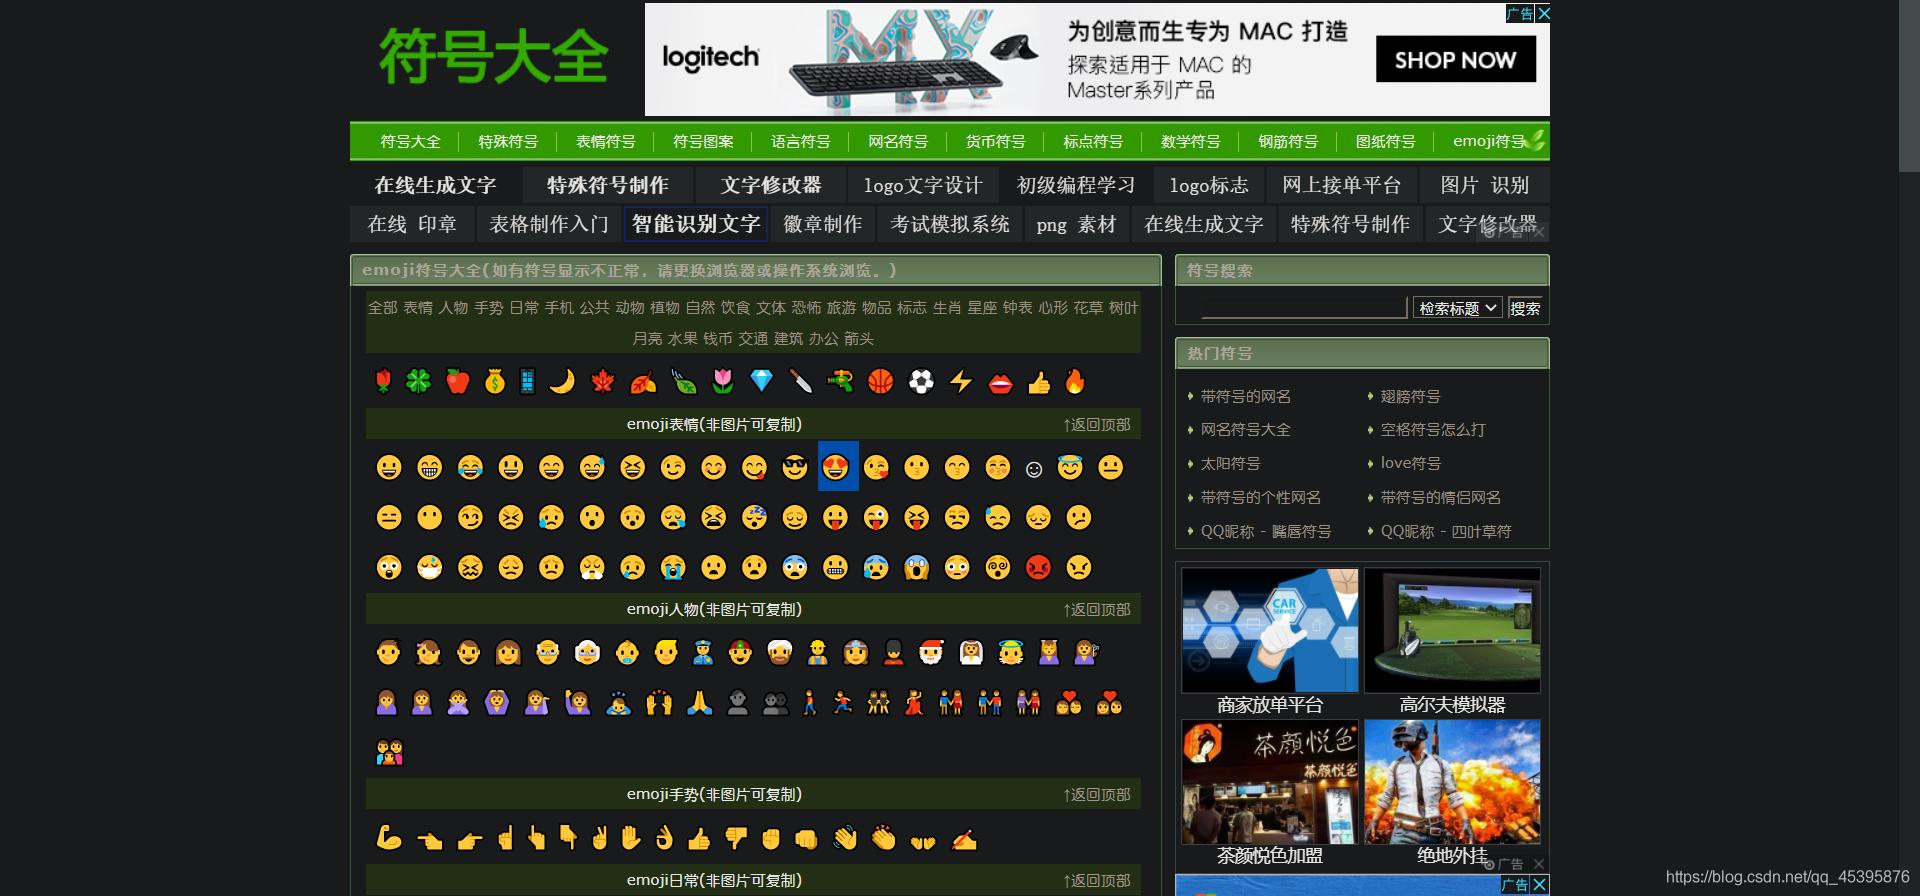 emoji符号大全